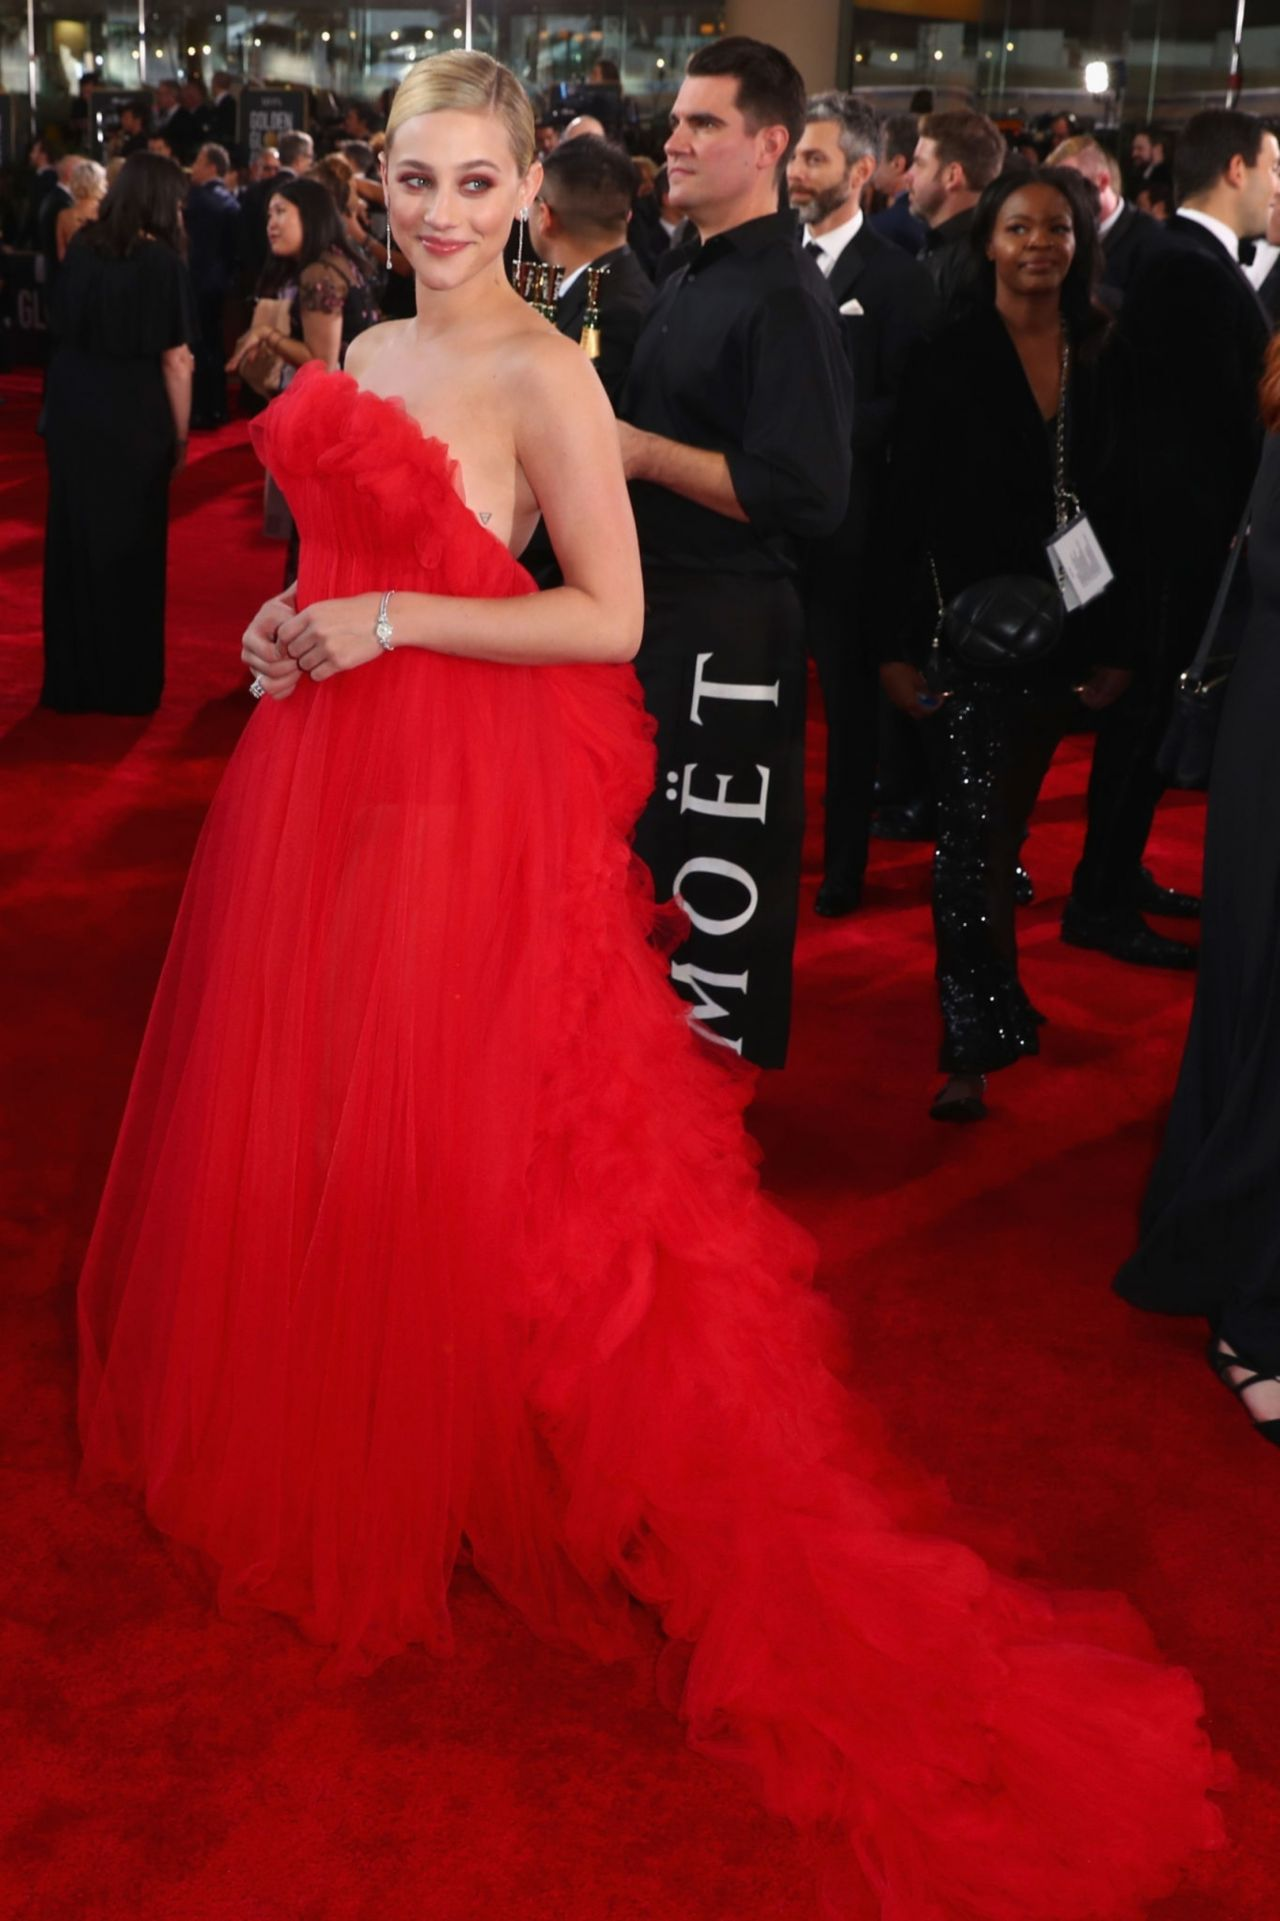 Lili Reinhart 2019 Golden Globe Awards Red Carpet